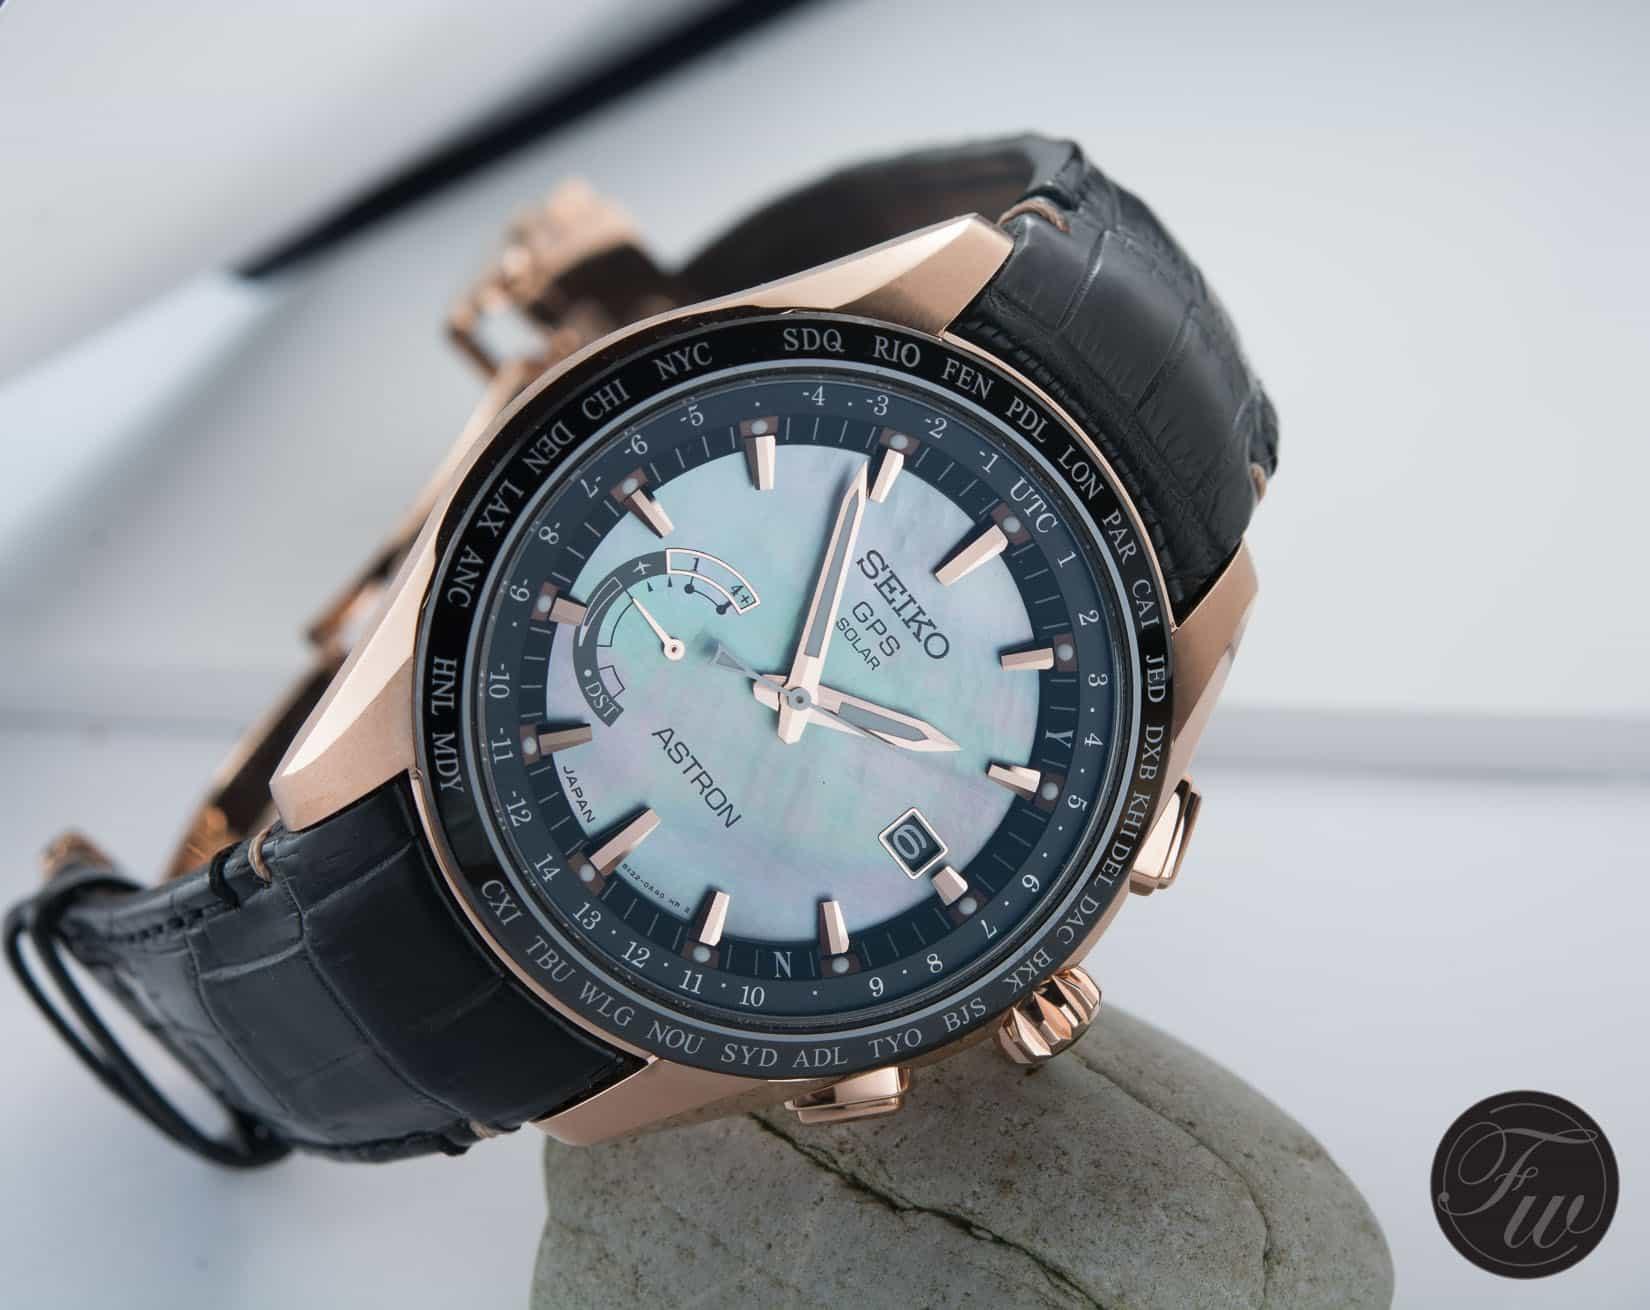 Seiko Astron GPS Solar World-Time. The Novak Djokovic Limited Edition